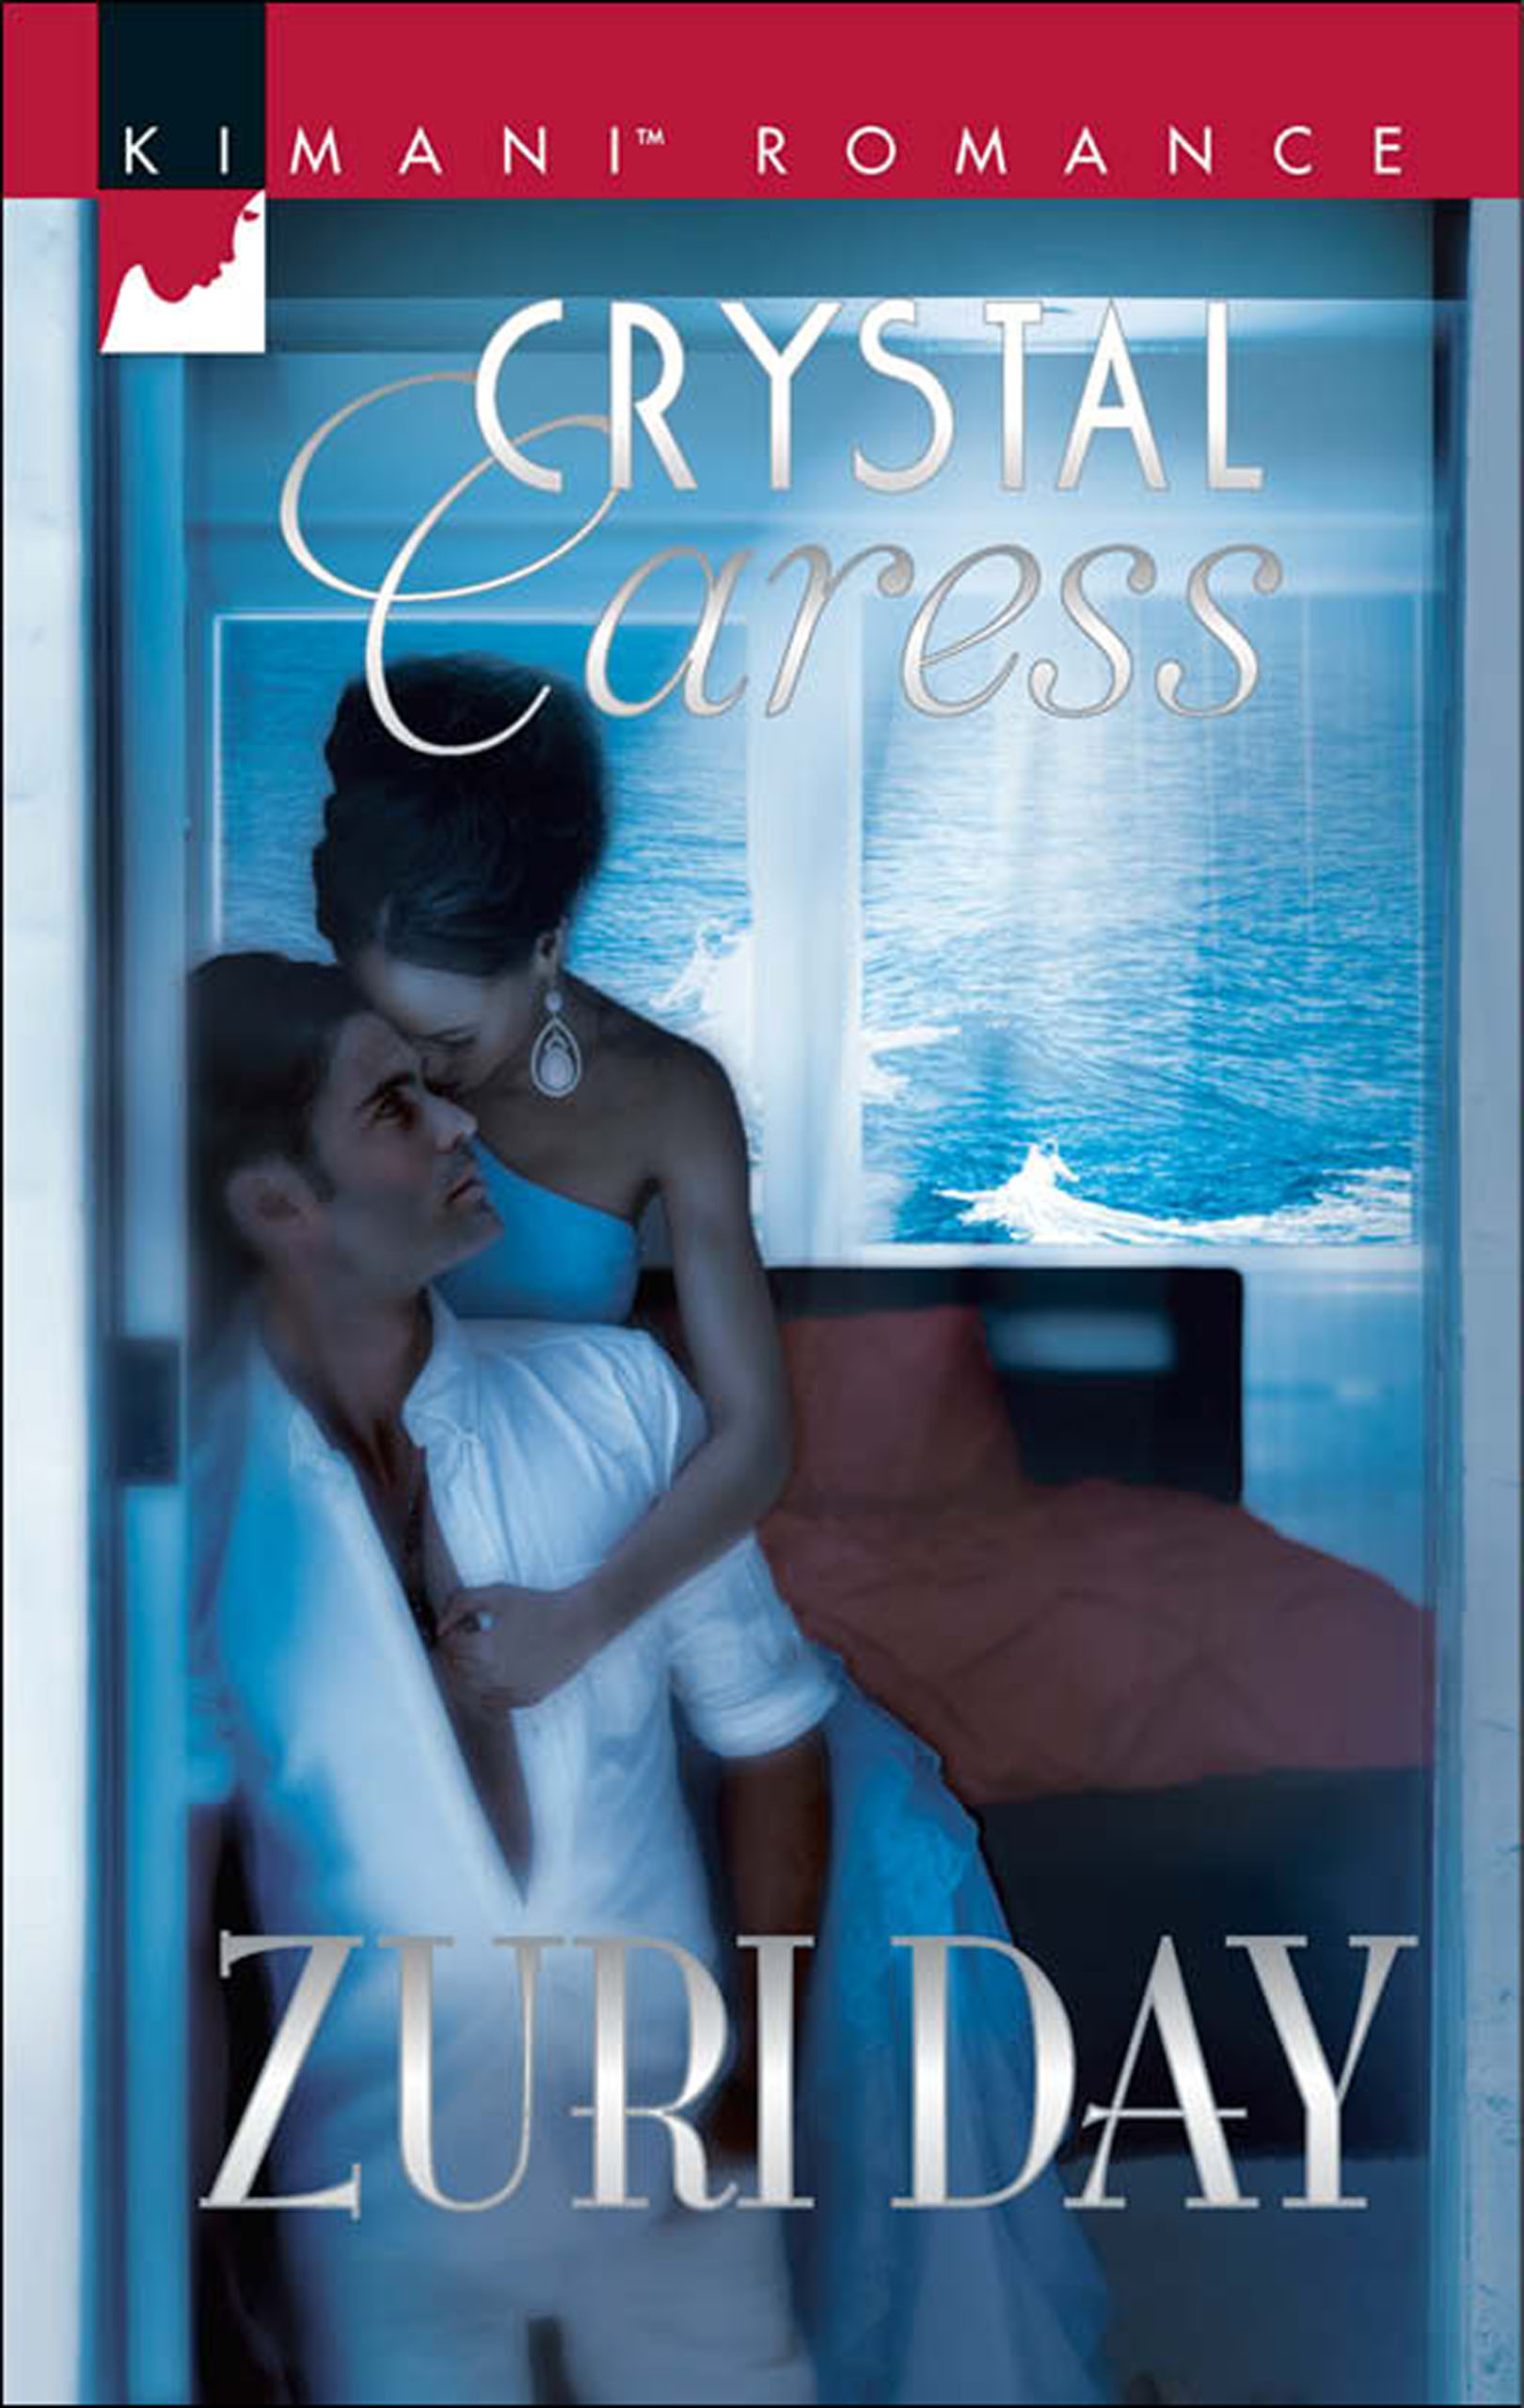 Zuri Day, Crystal Caress – читать онлайн полностью – ЛитРес